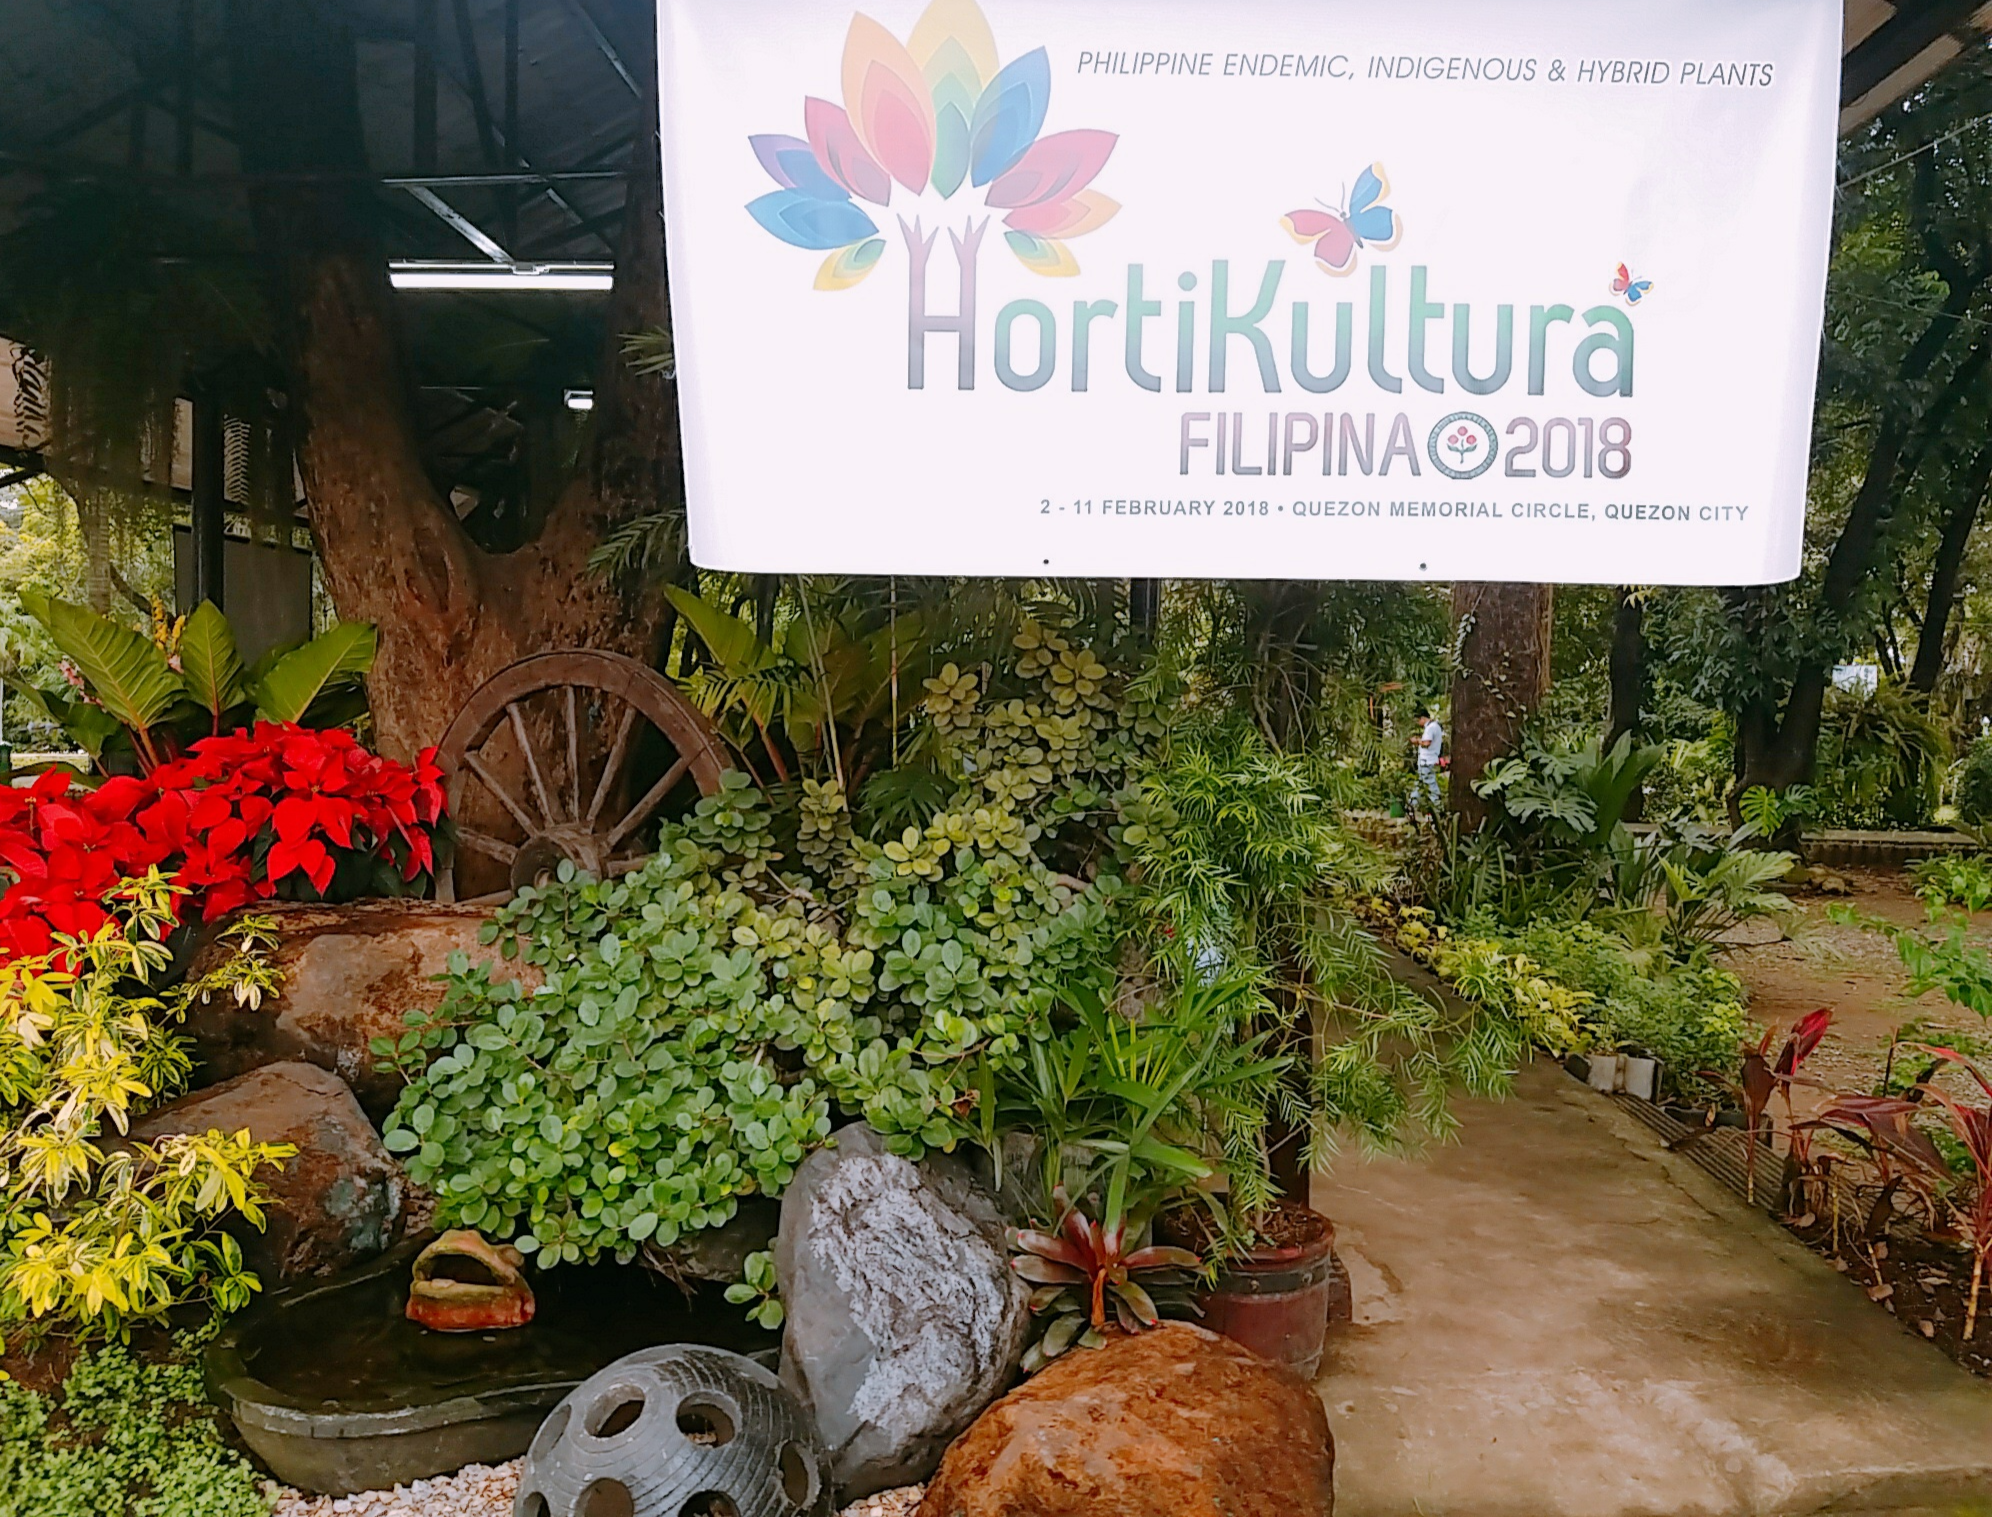 HortiKultura-Filipina-2018